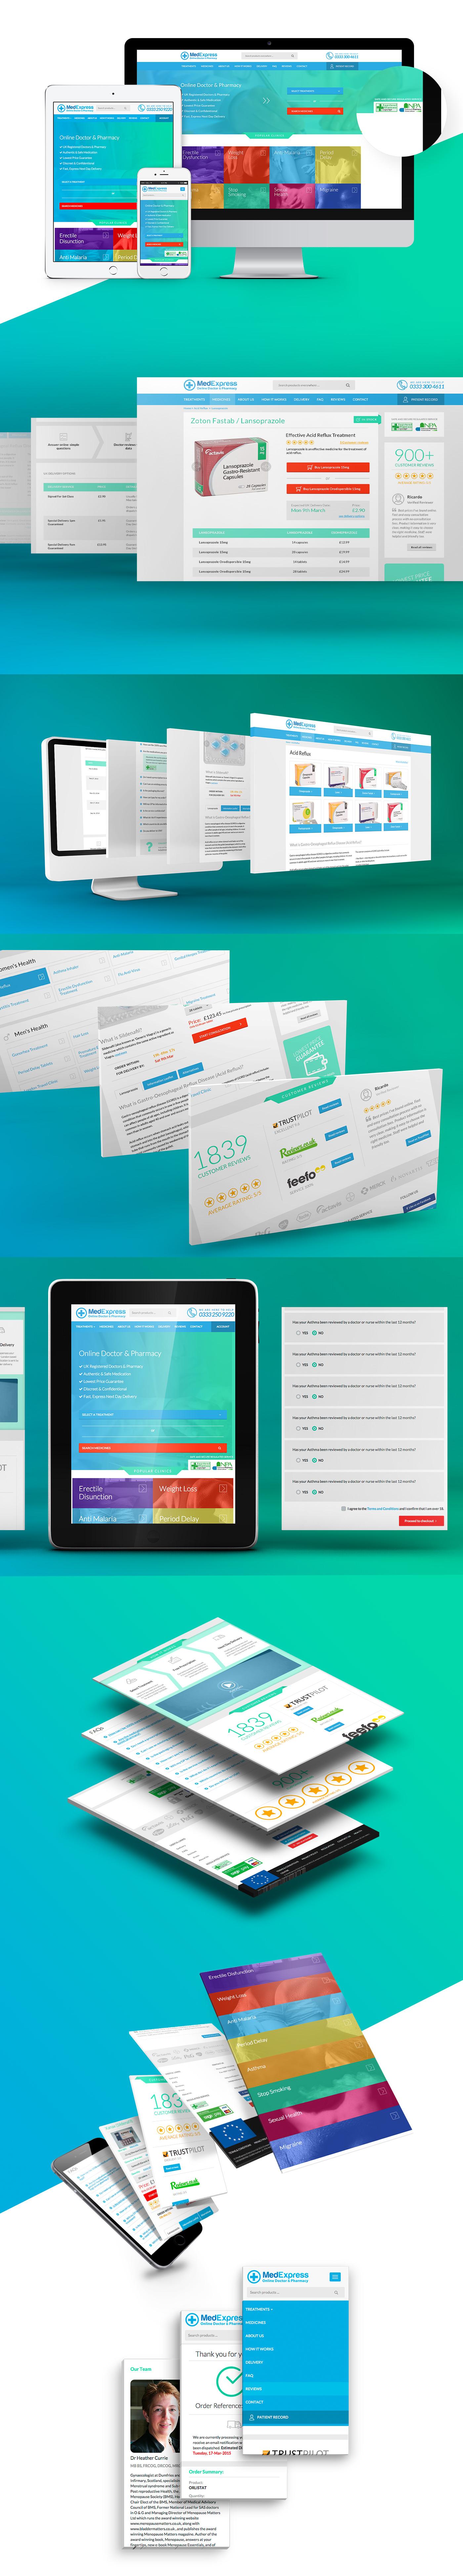 Responsive Design for MedExpress